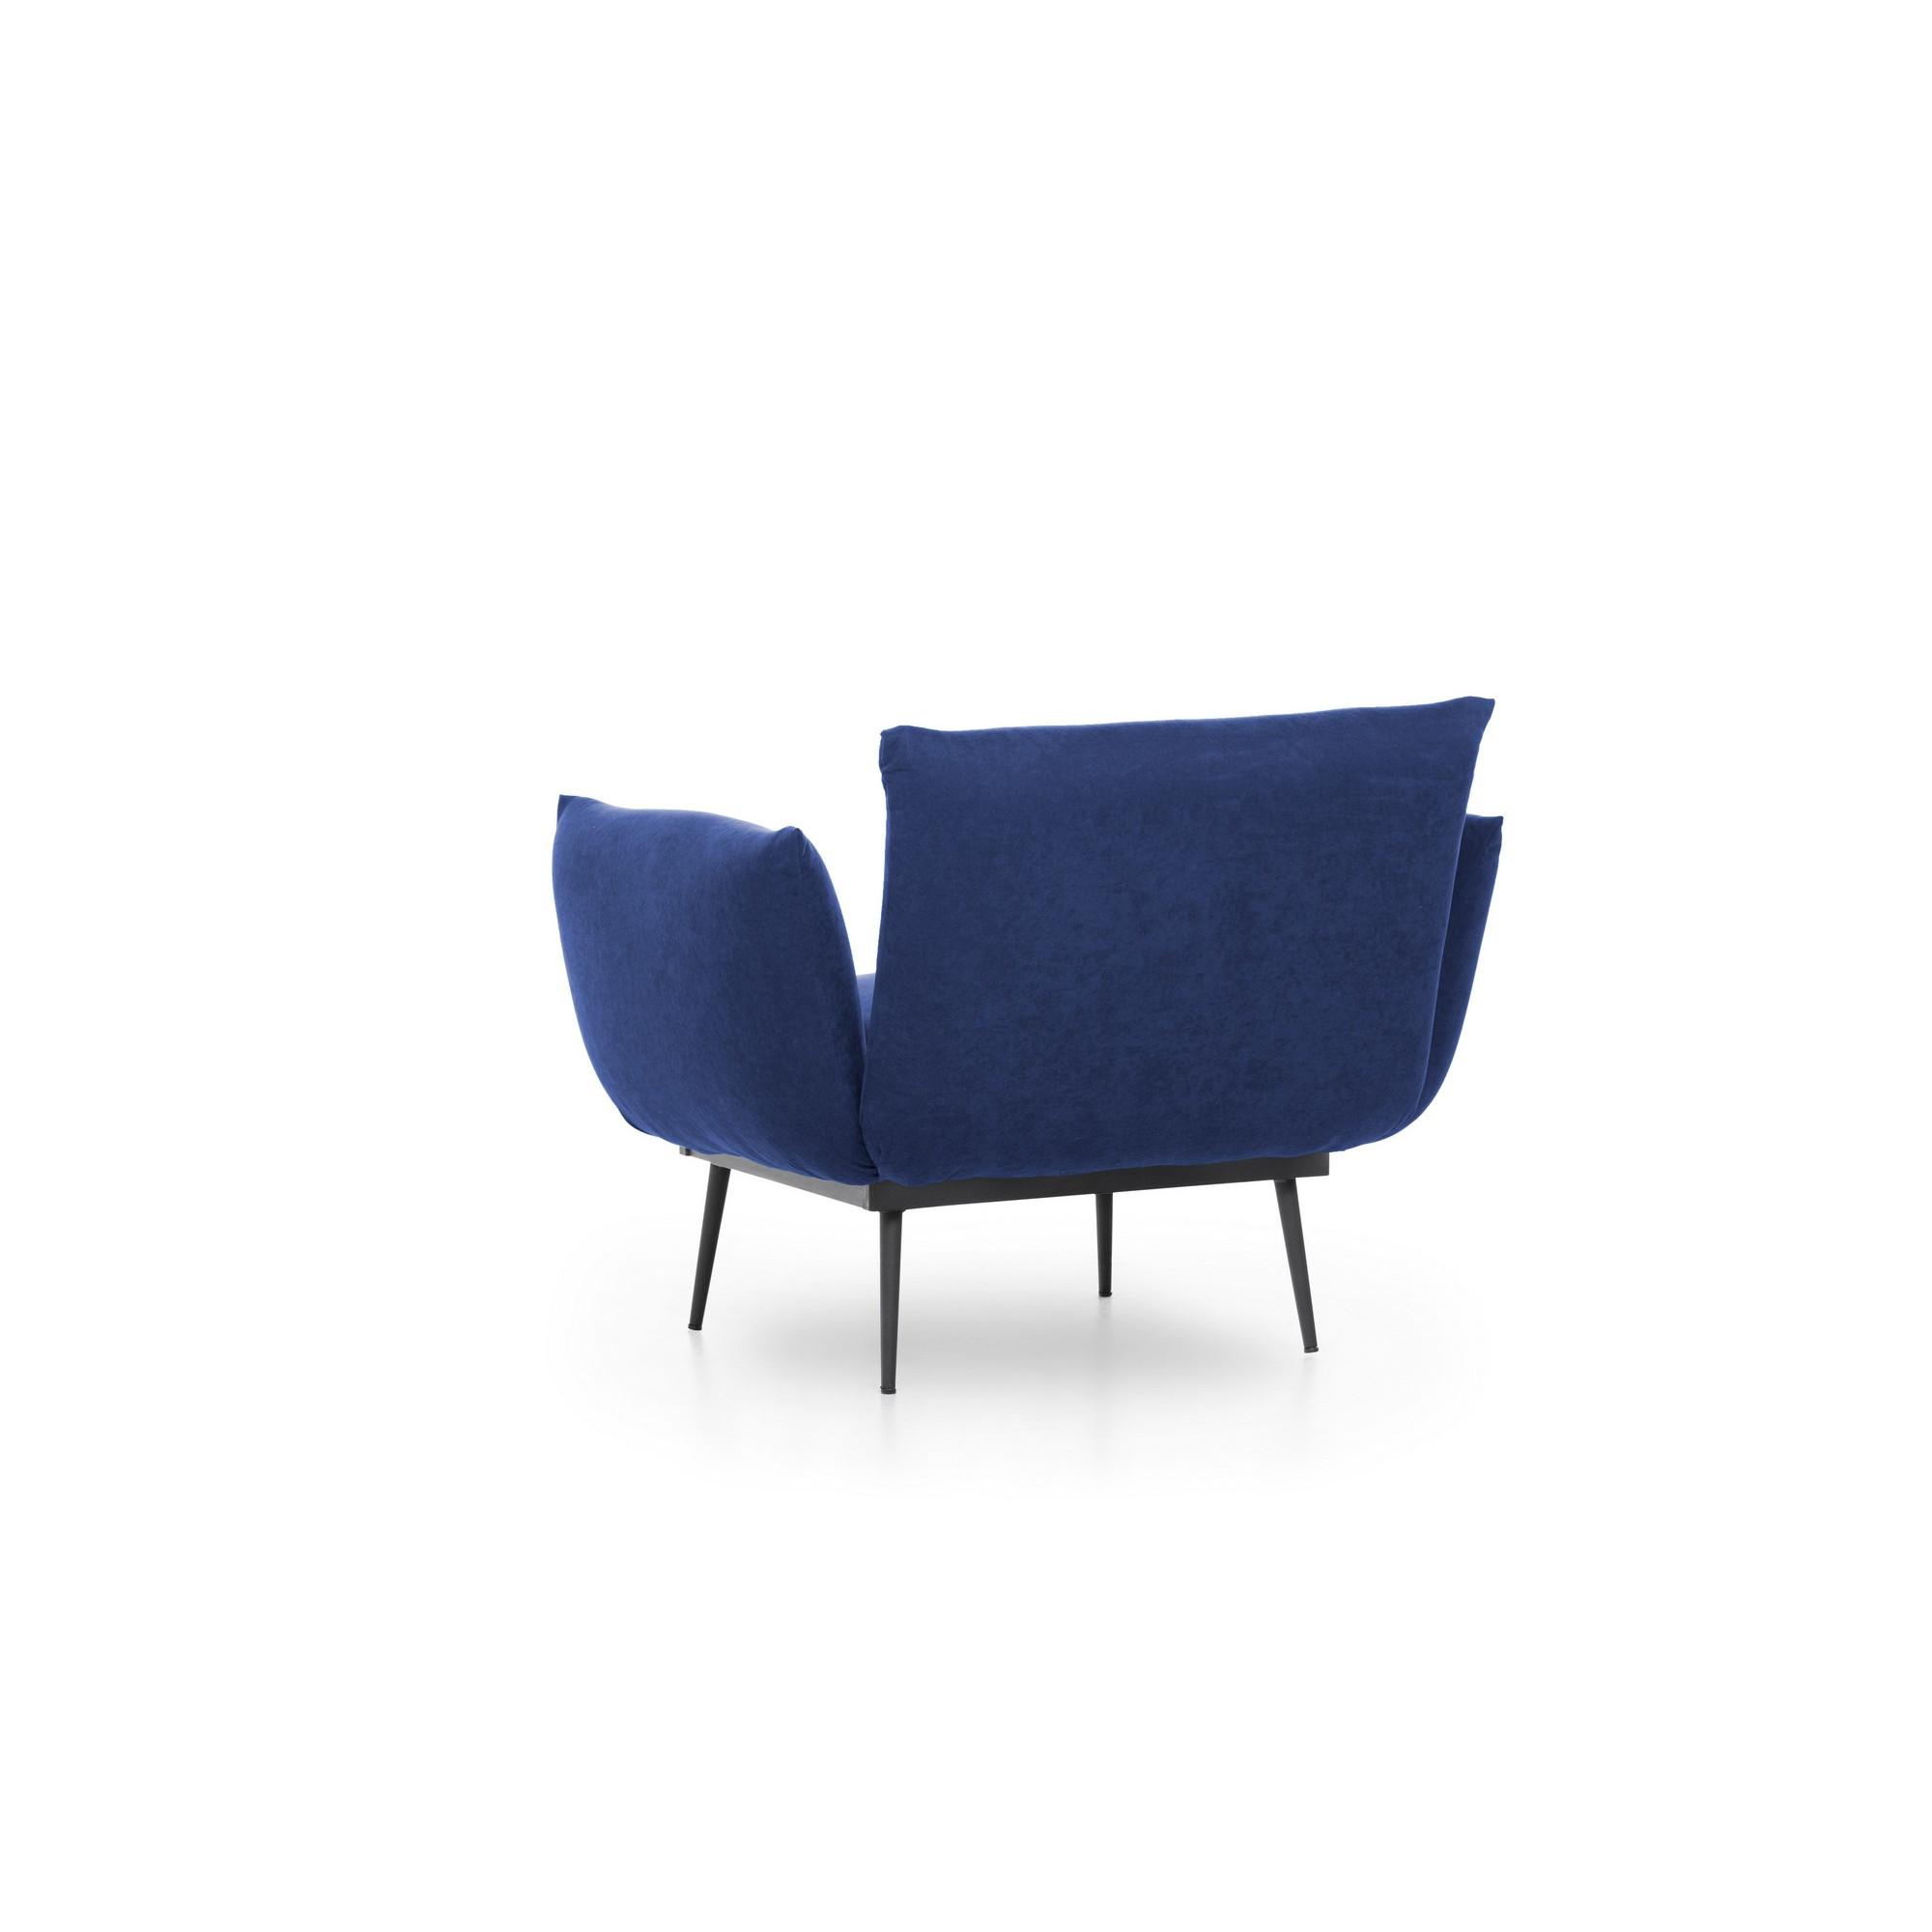 1-Sitzer-Sofa Jax Solo | Blau